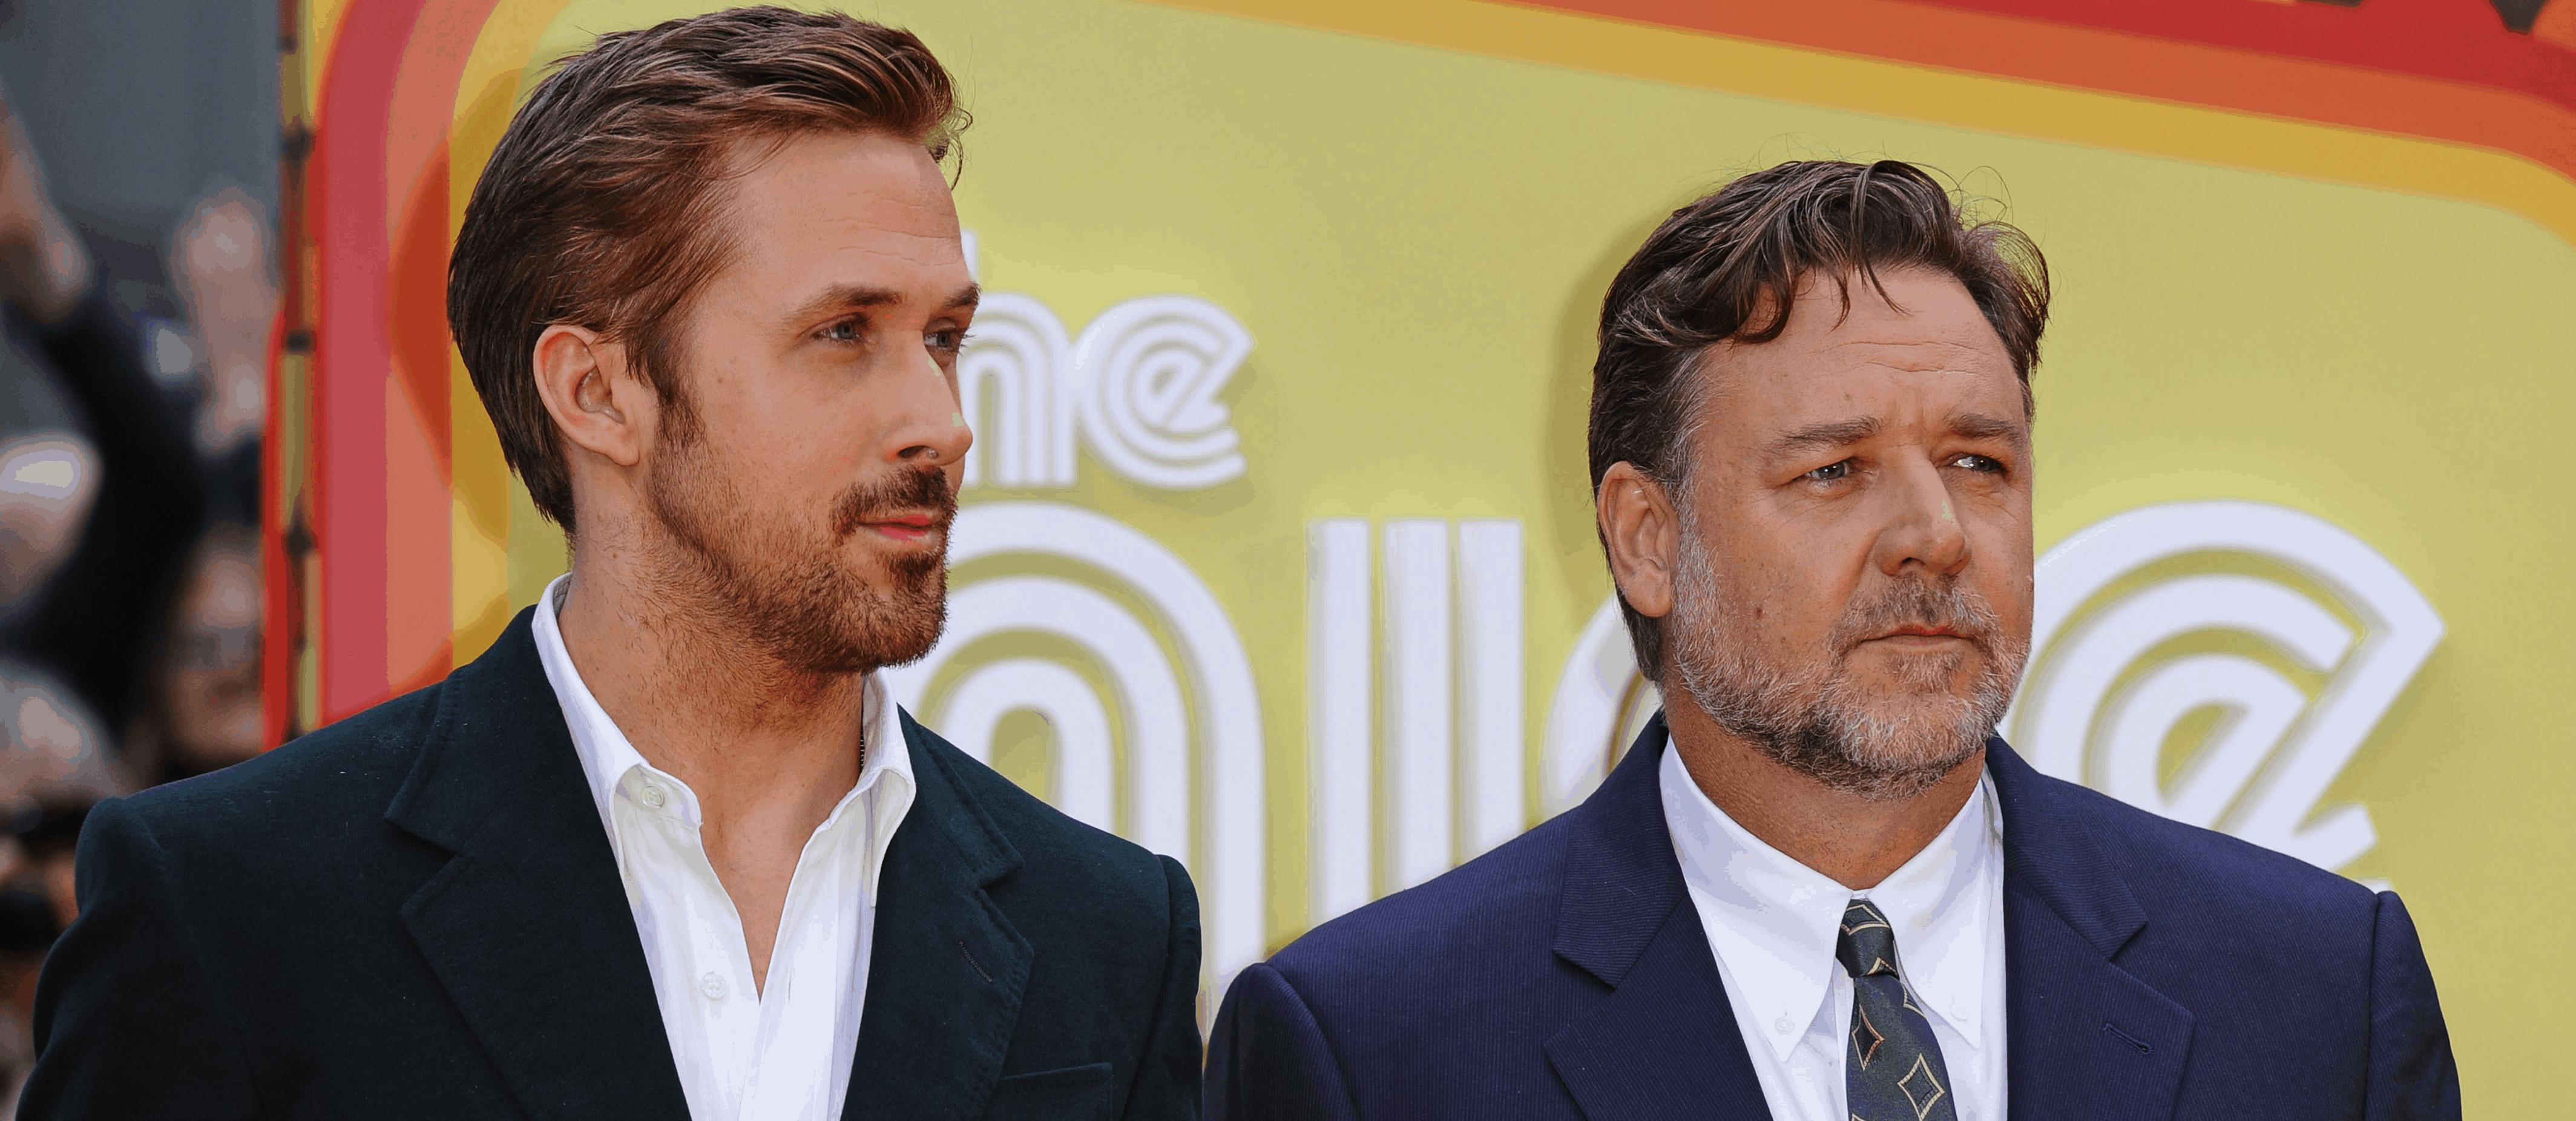 Ryan-Gosling-The-Nice-Guys-Premiere-London-2016-250